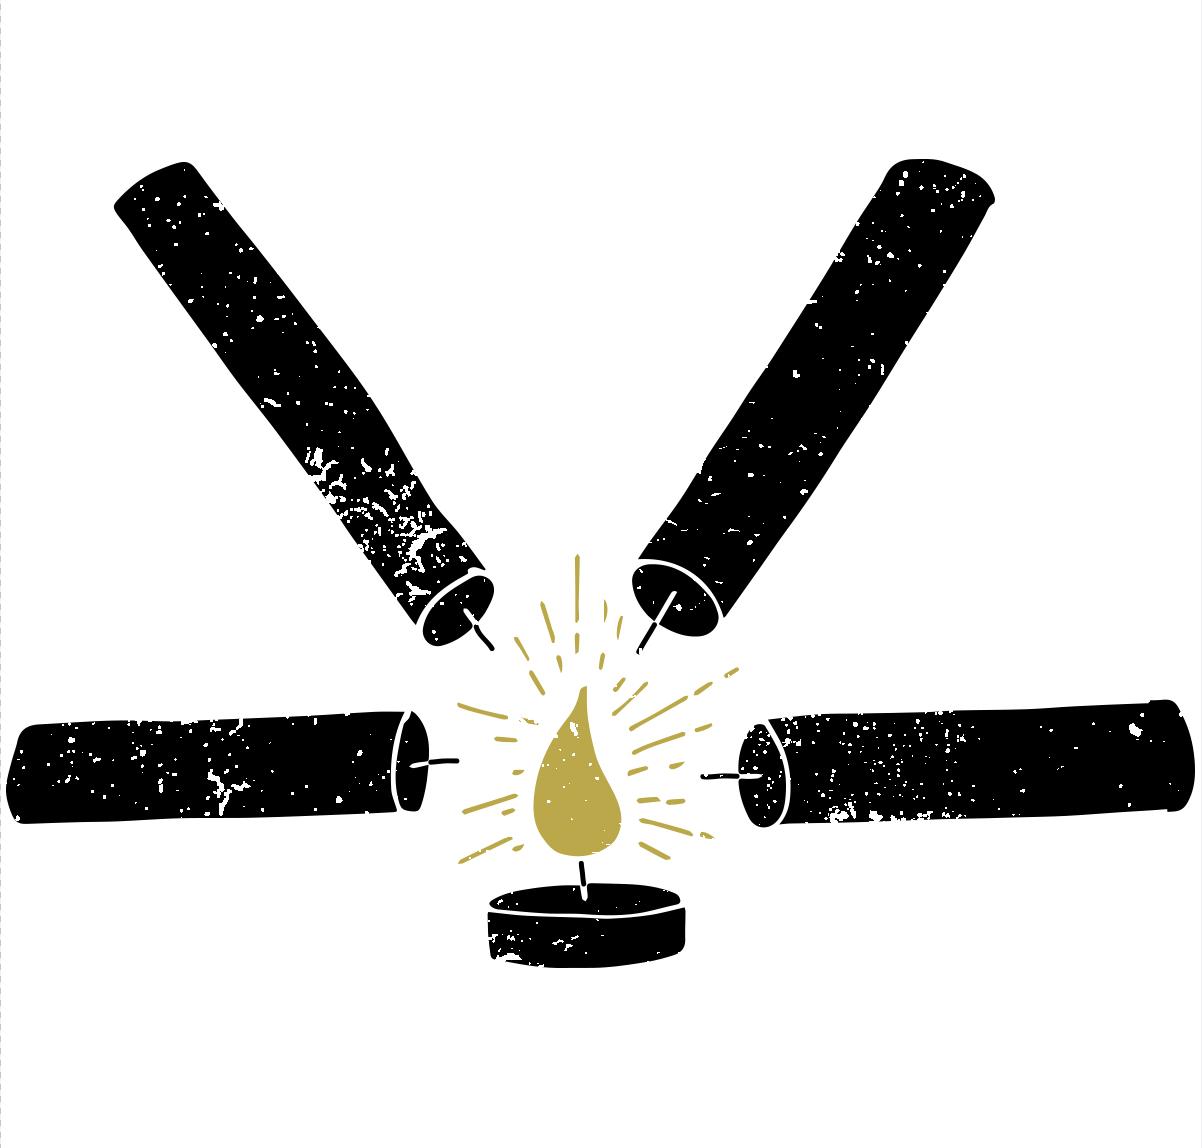 Lenten Journey: The Gift Of Limitations